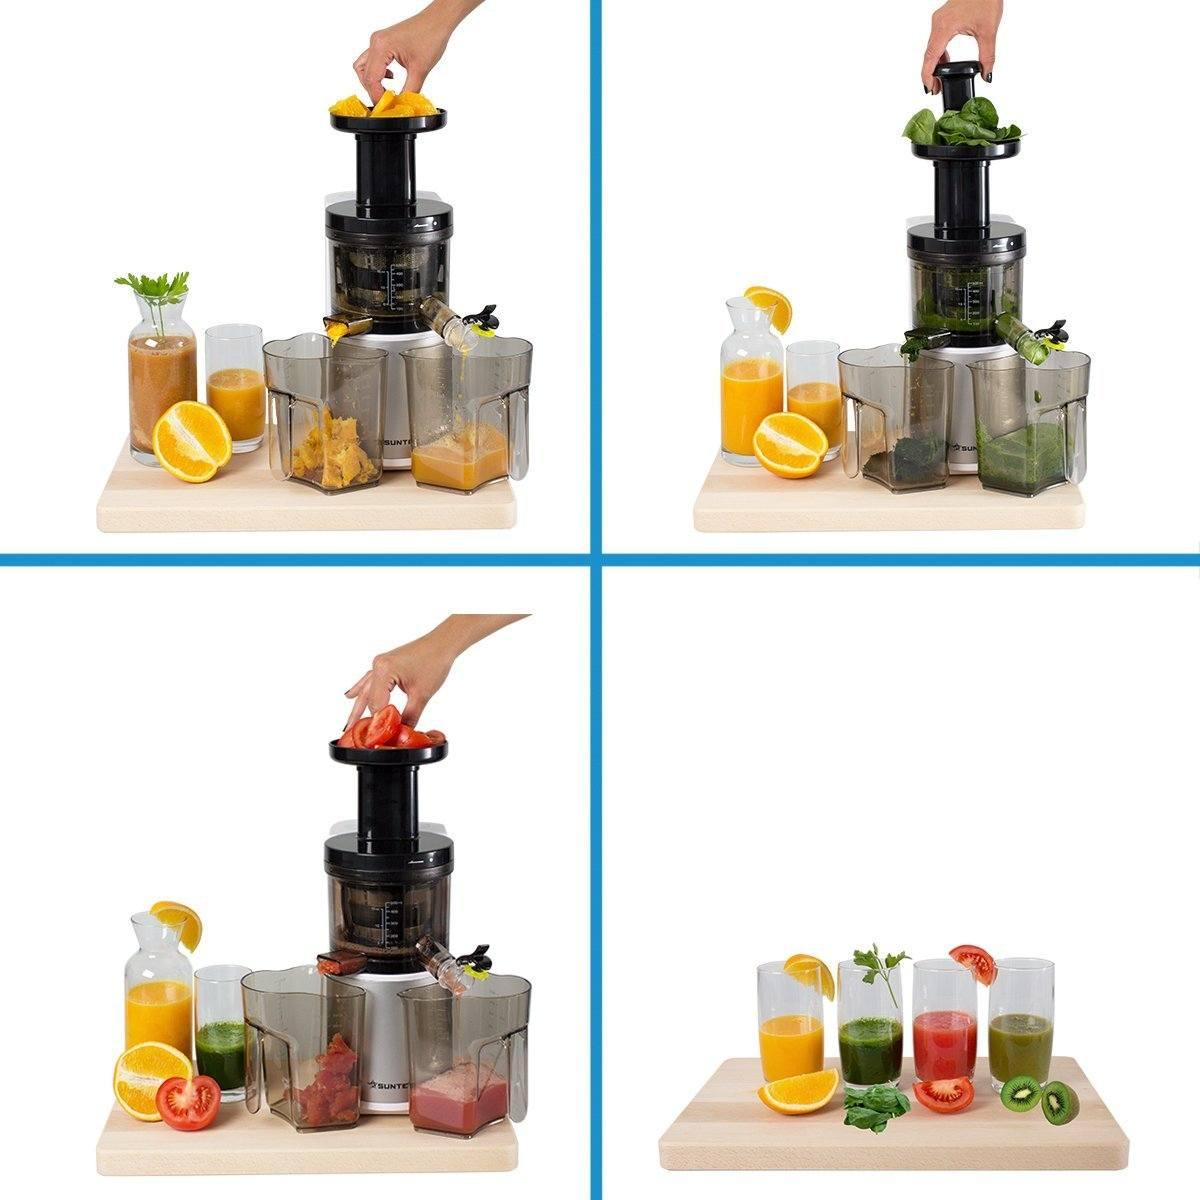 HOME Essentials Slow Juicer JUI 8120 Slow PRO1